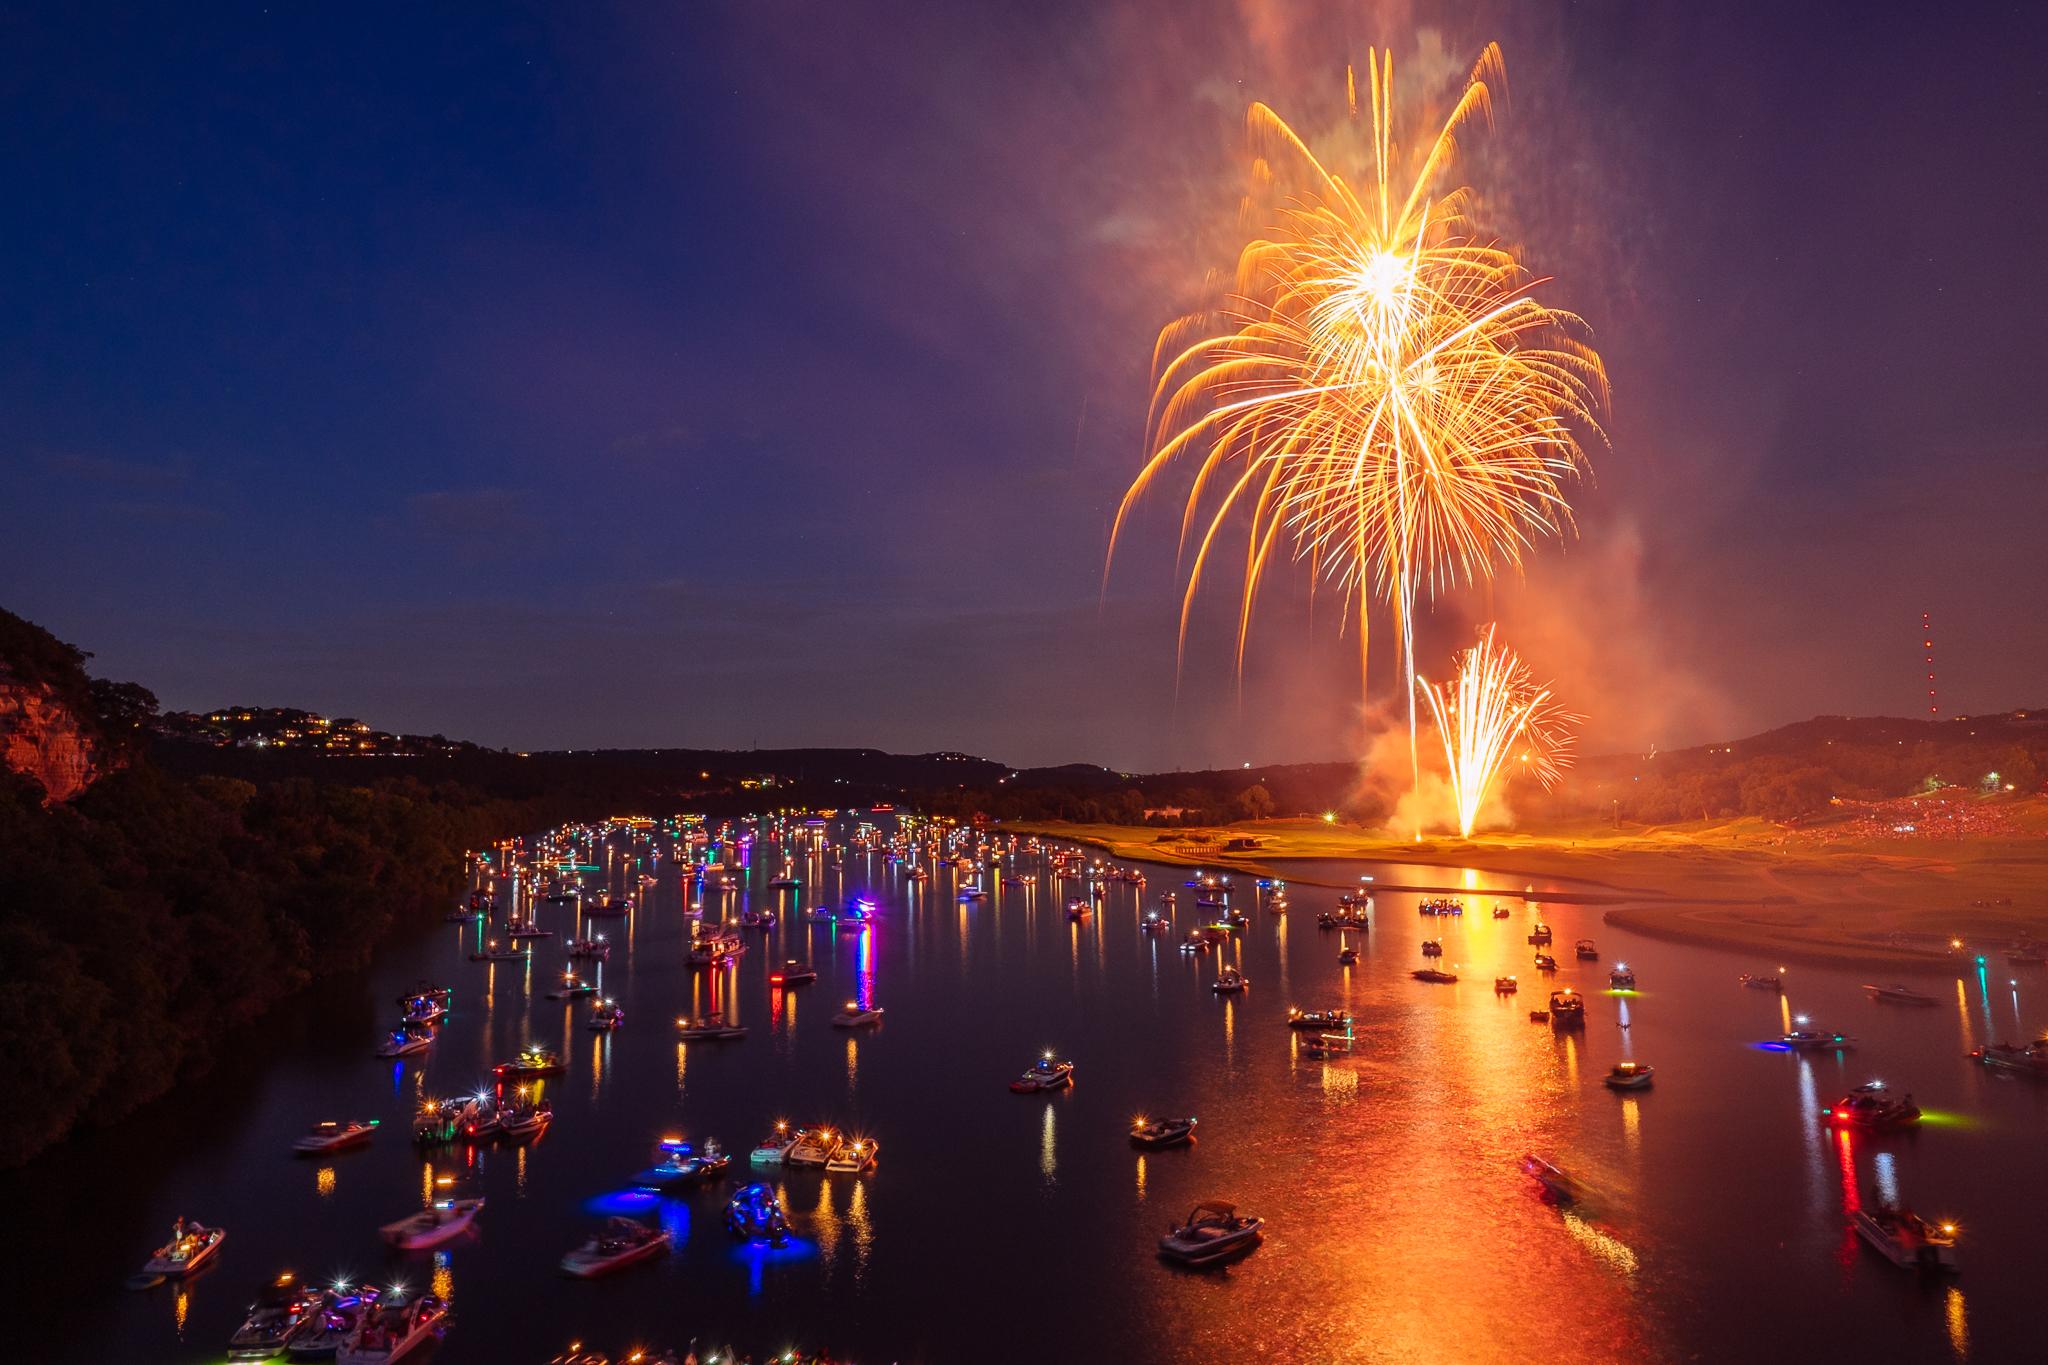 austin_fireworks_2014_4.jpg